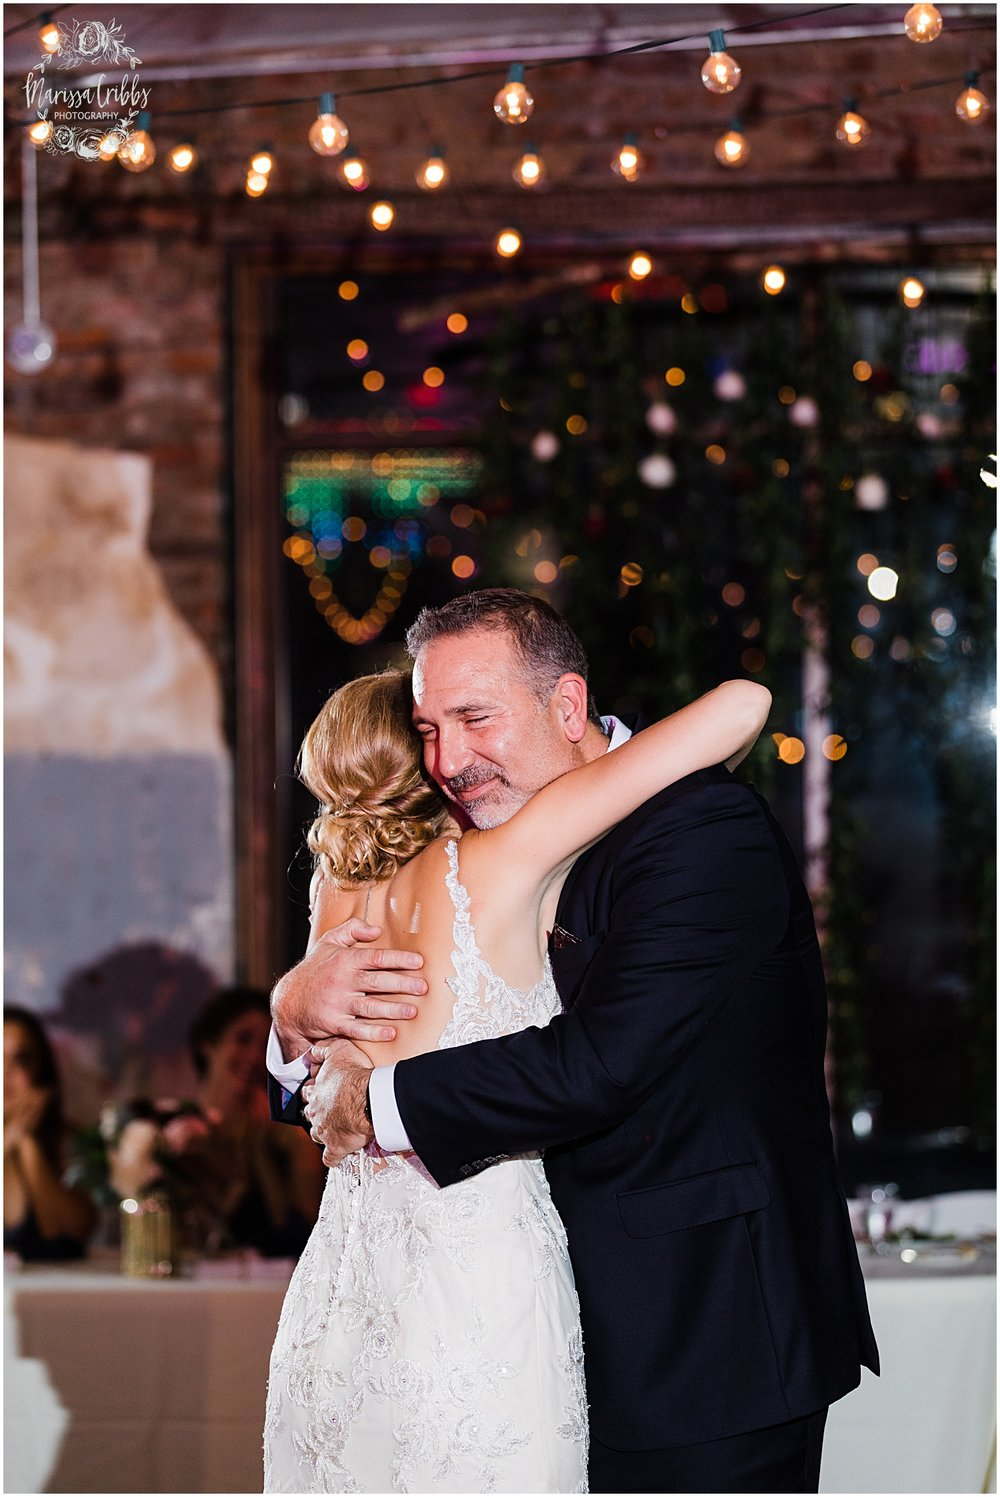 BAUER WEDDING | KELSEA & JUSTIN | MARISSA CRIBBS PHOTOGRAPHY_6601.jpg